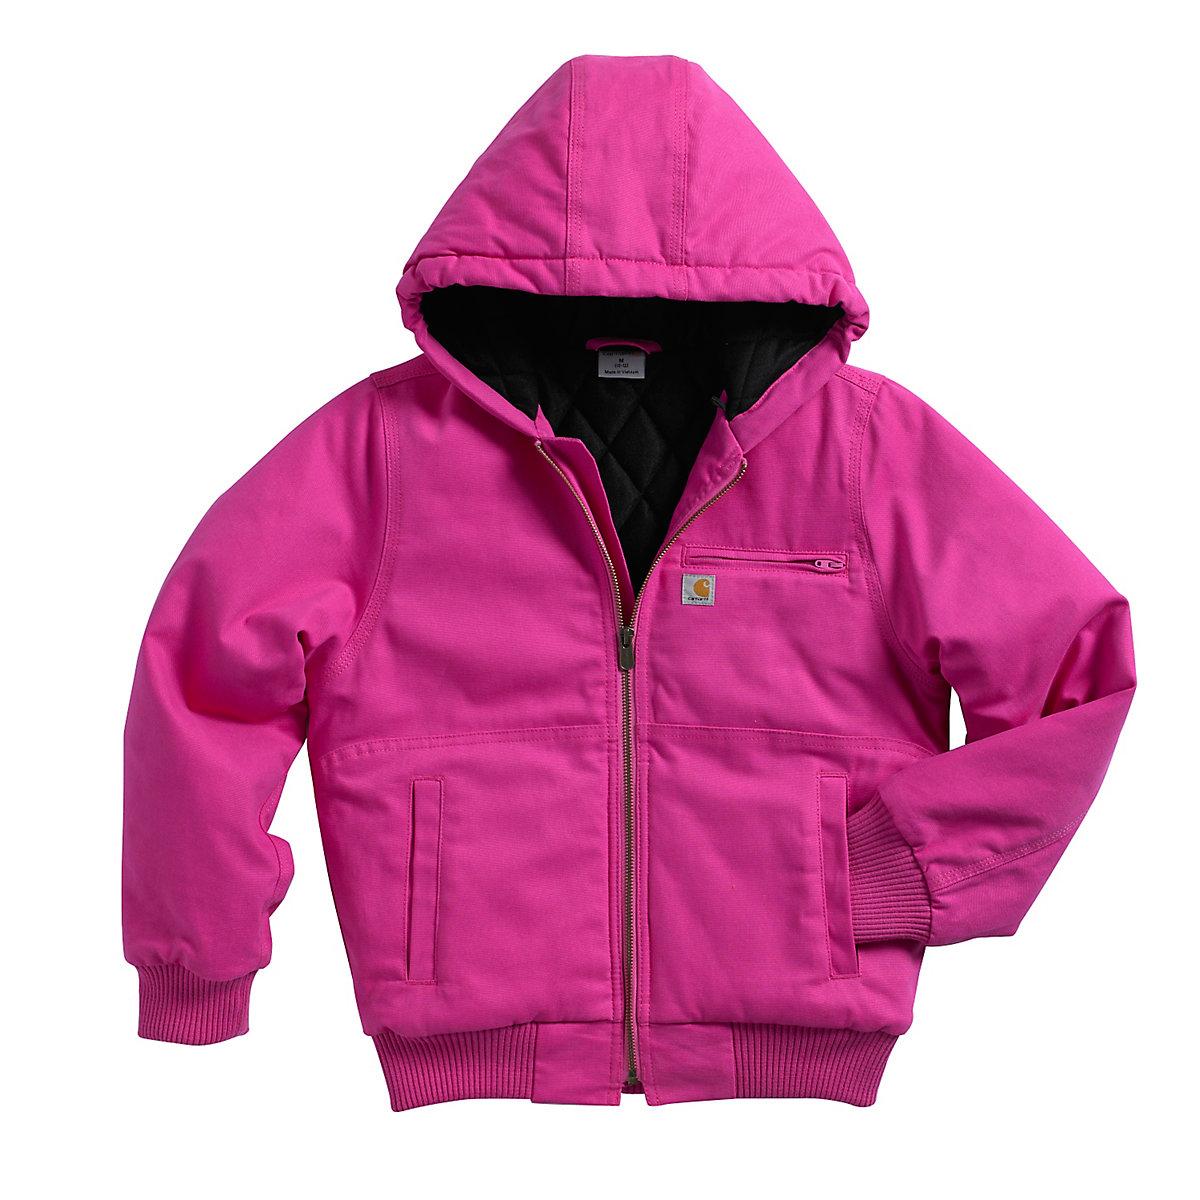 Girlsu0026#39; Girlsu0026#39; Wildwood Jacket CP9499 | Carhartt